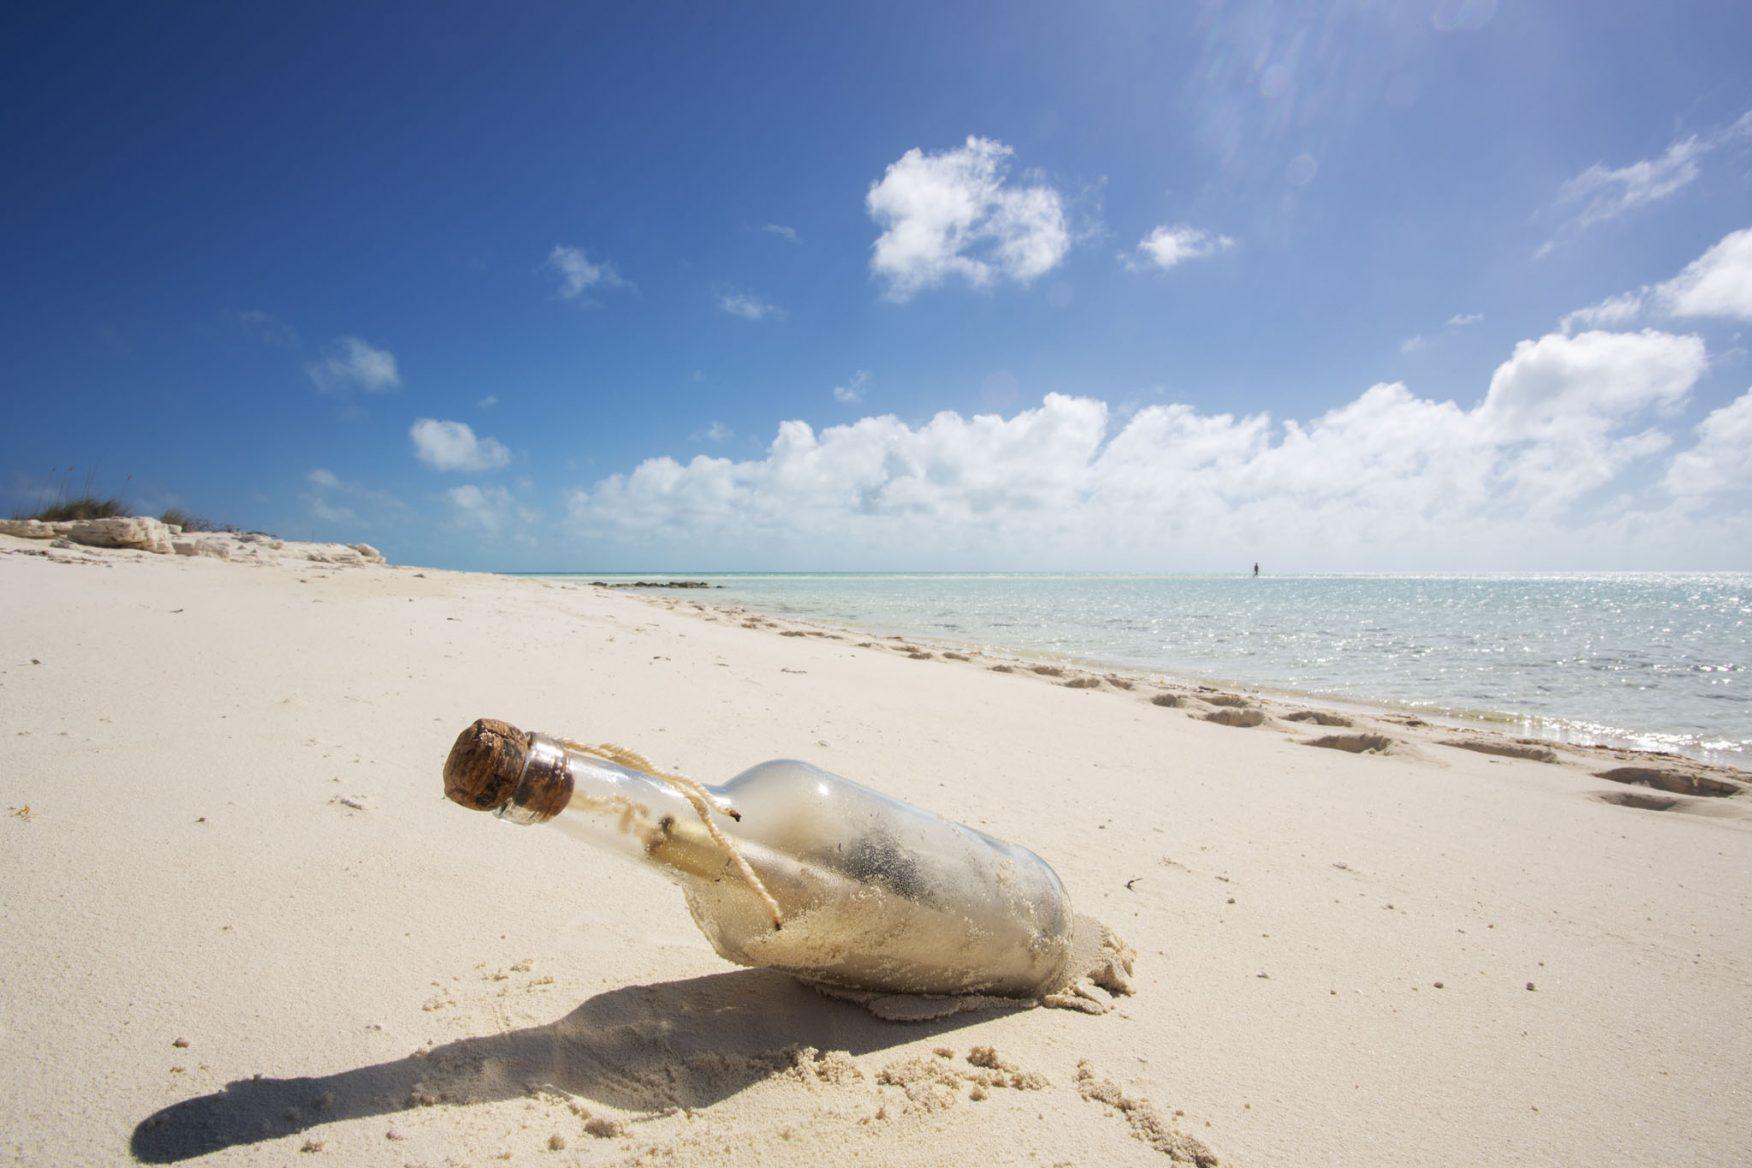 boats_honeymoon-desertedbeach-bahamasjpg